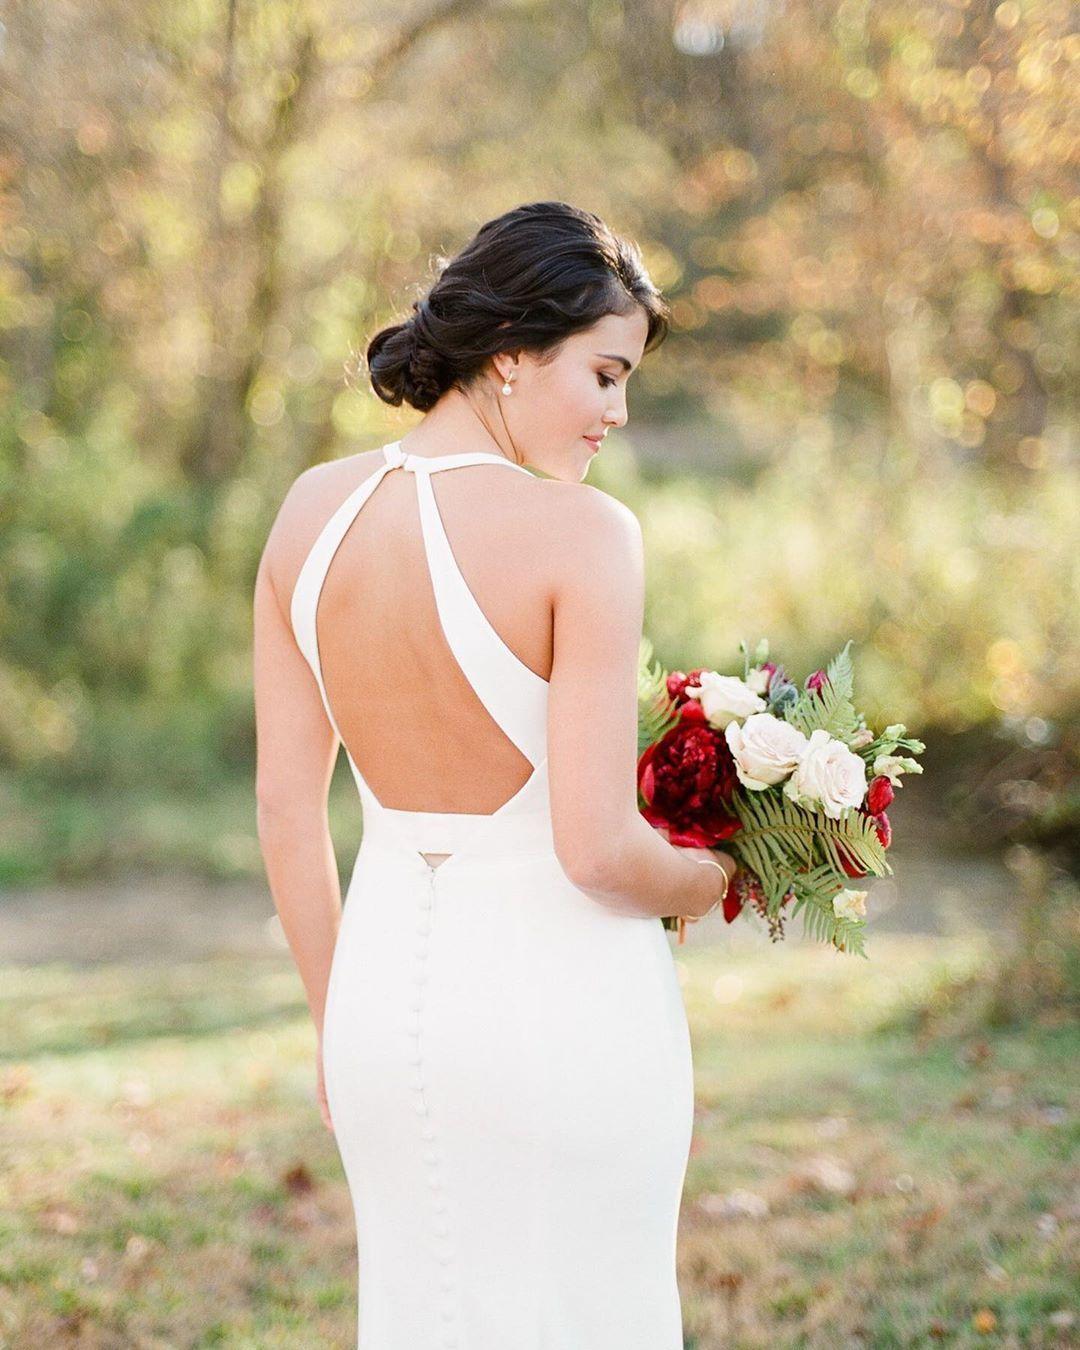 Halter Top Wedding Dress Style 2150 Top Wedding Dresses